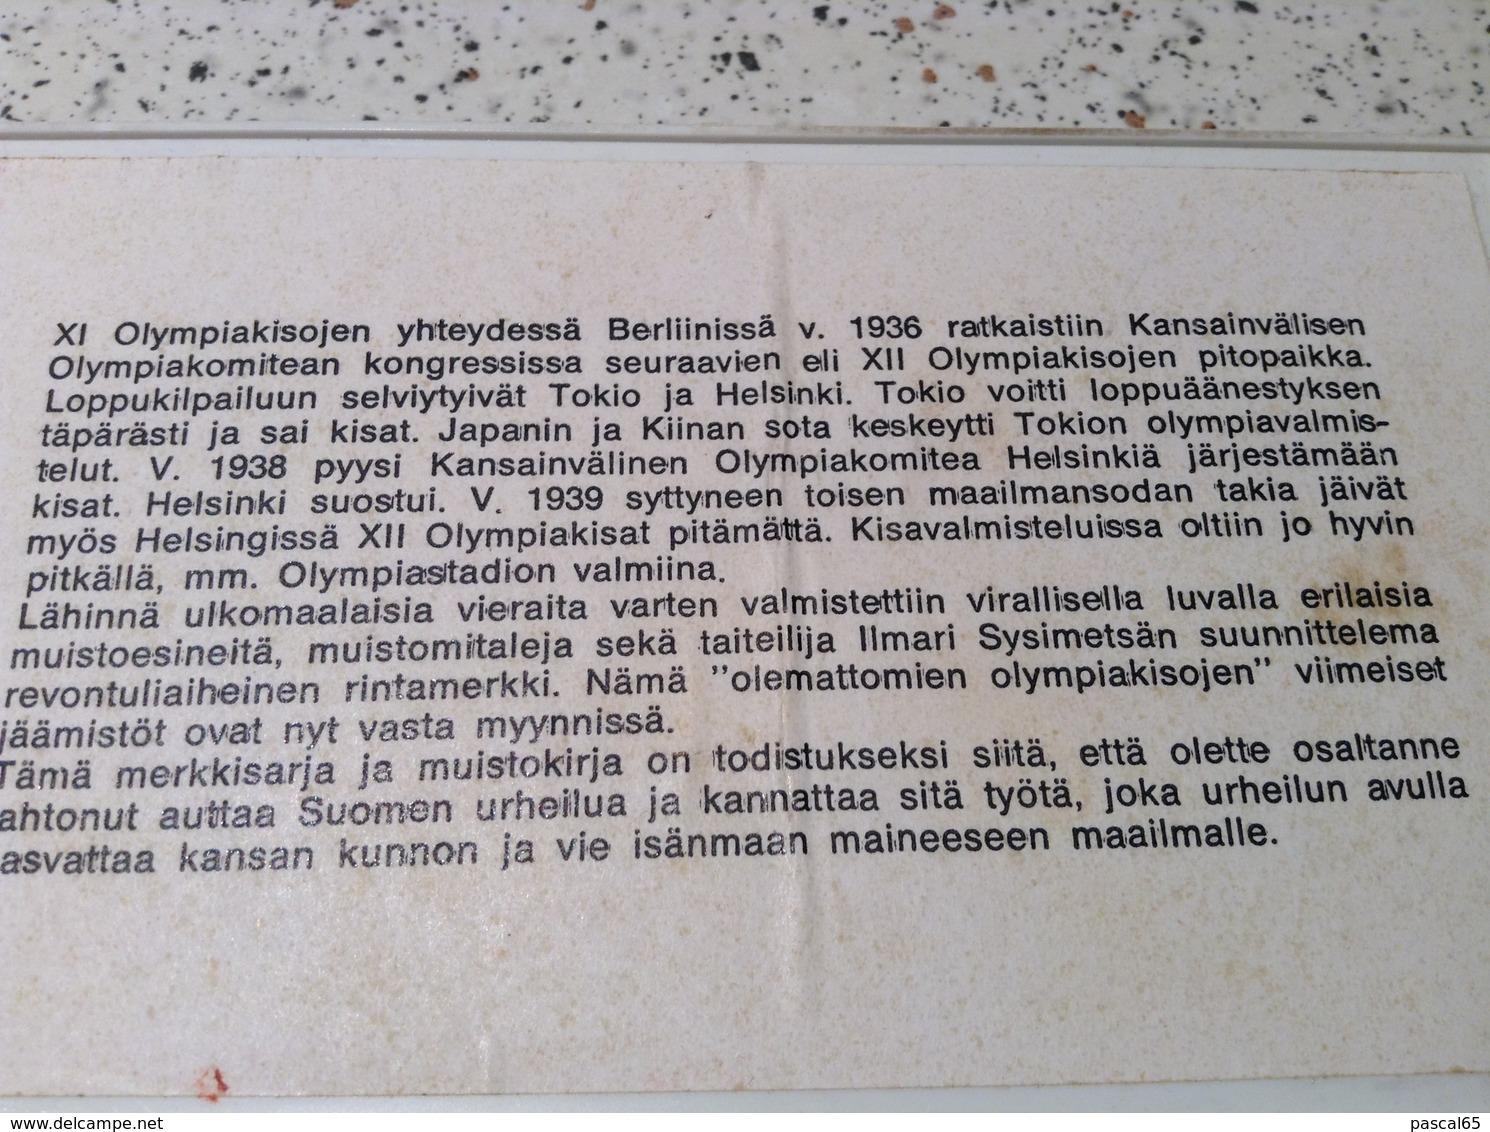 3 Badges Originaux 12 Jeux Olympiques Helsinki 1940 XII Olympic Games Finland - Bekleidung, Souvenirs Und Sonstige